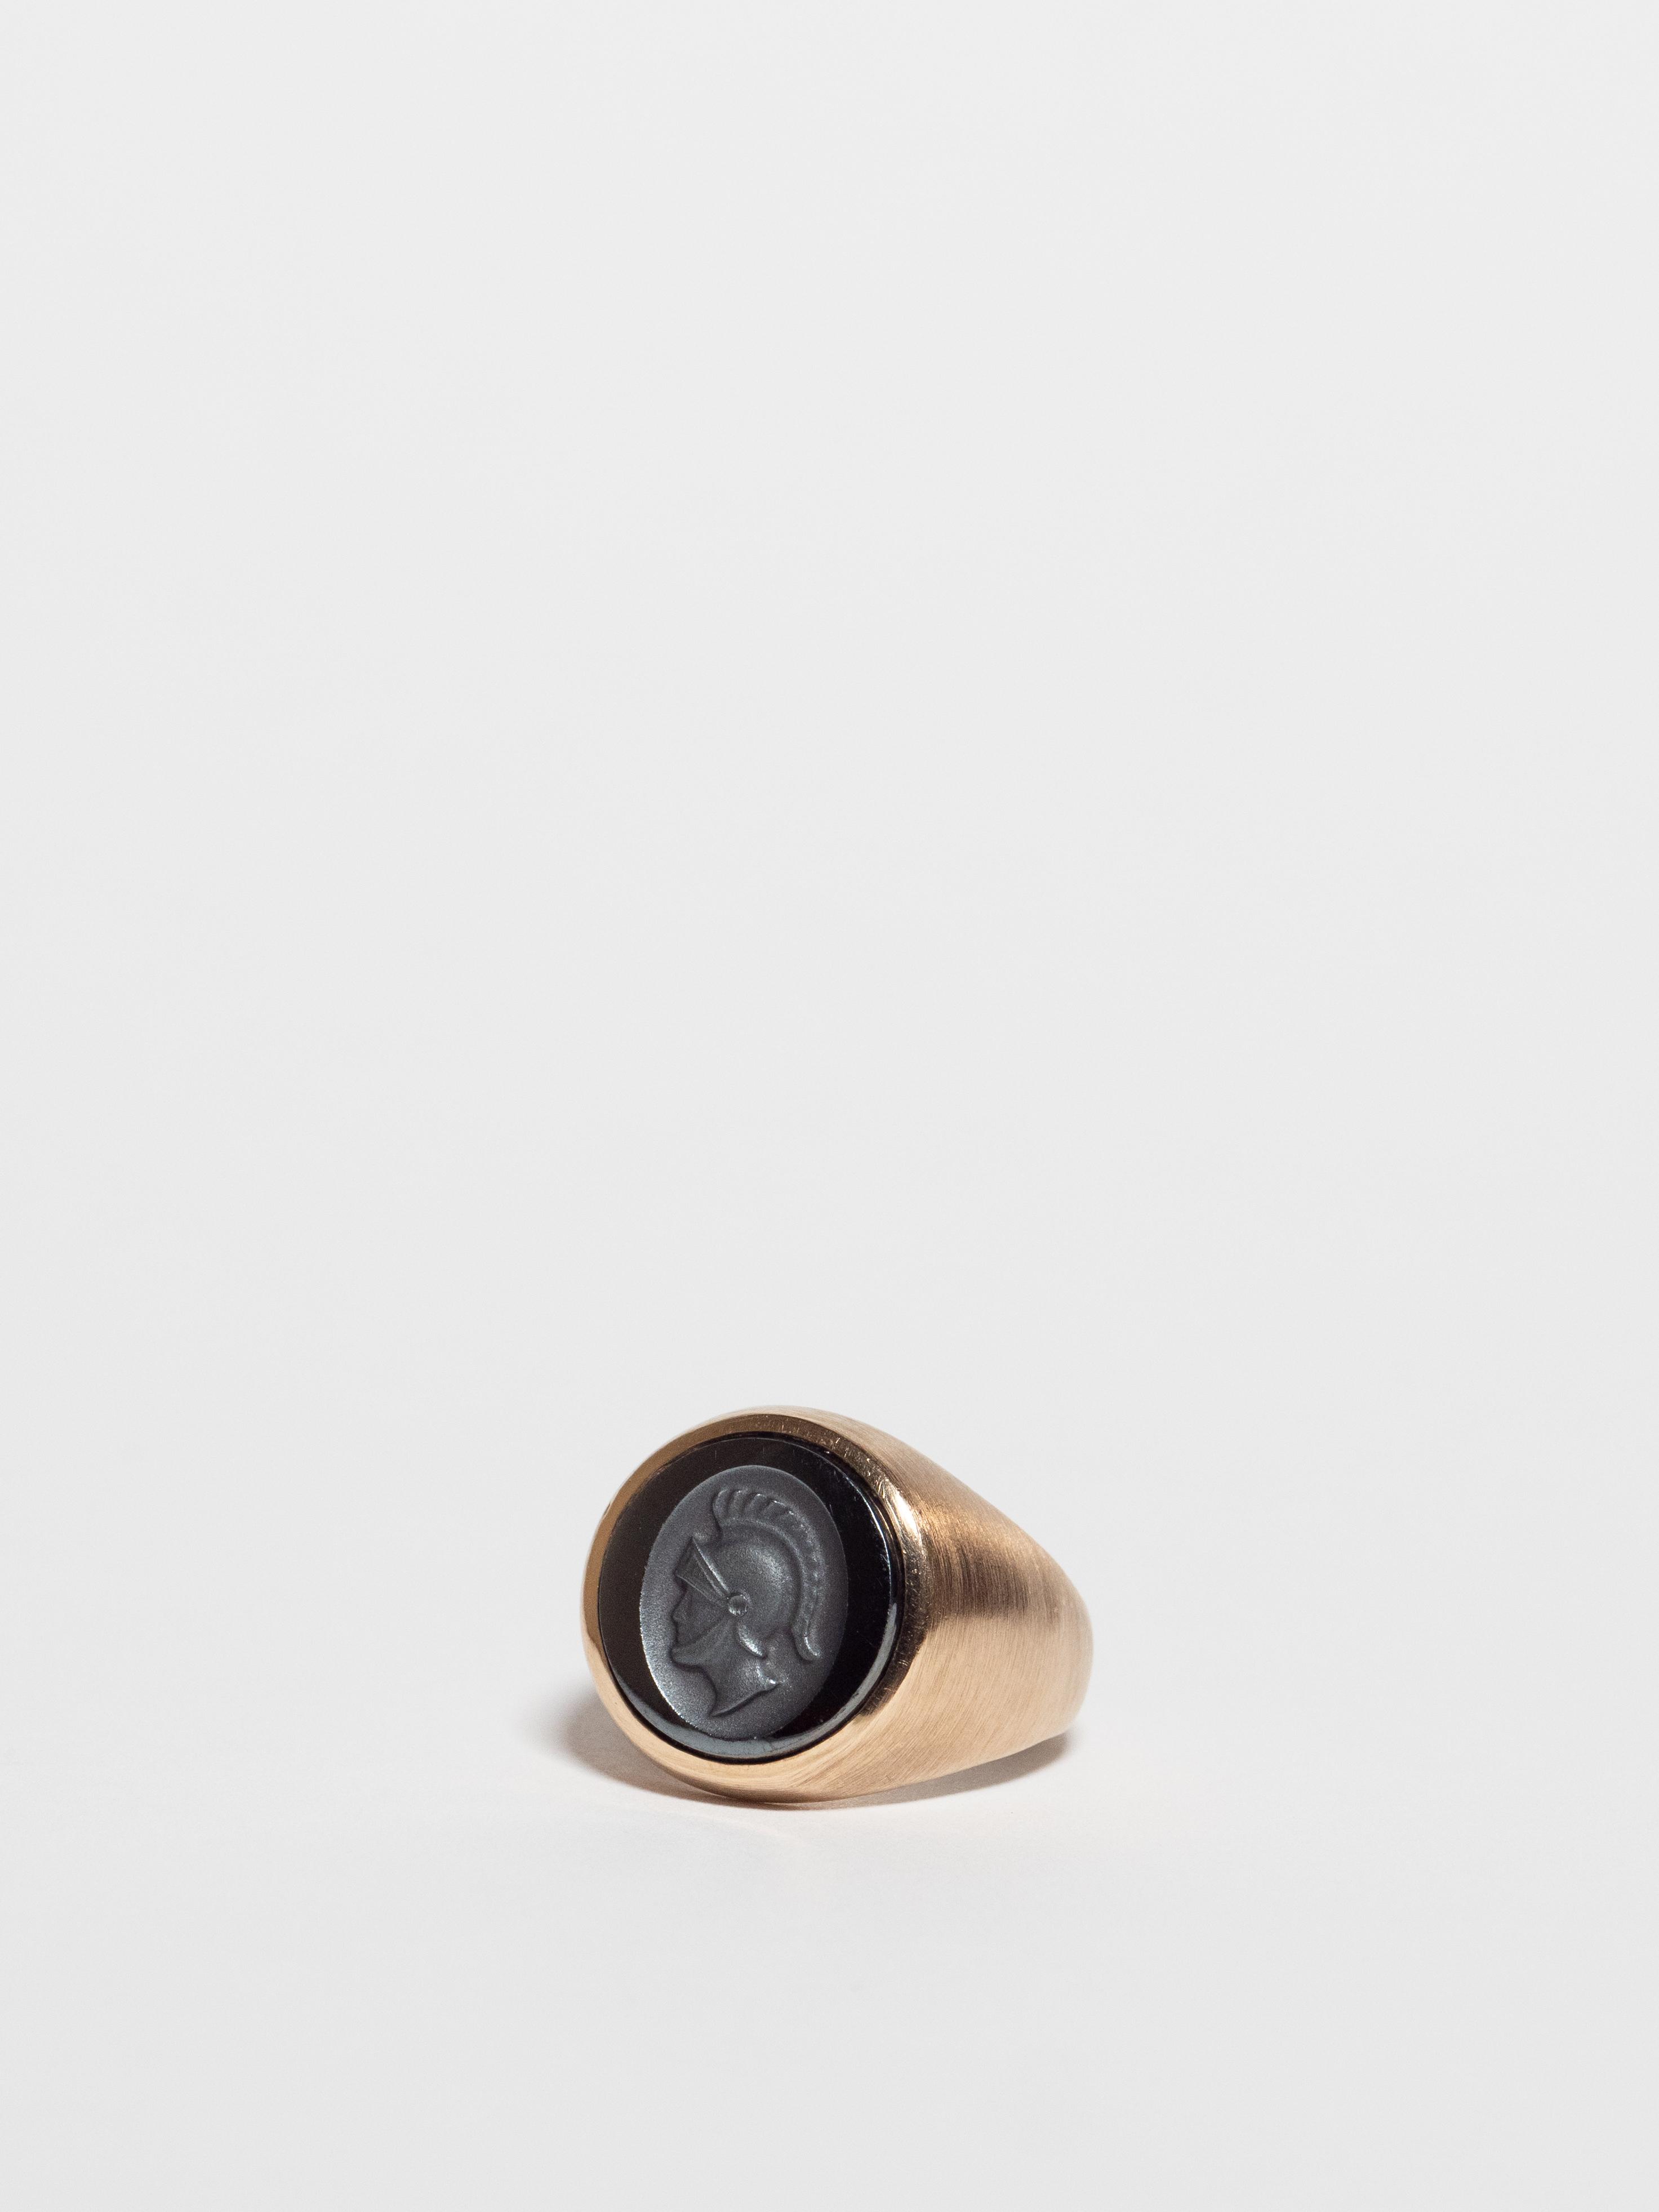 Knight Cameo Ring / America